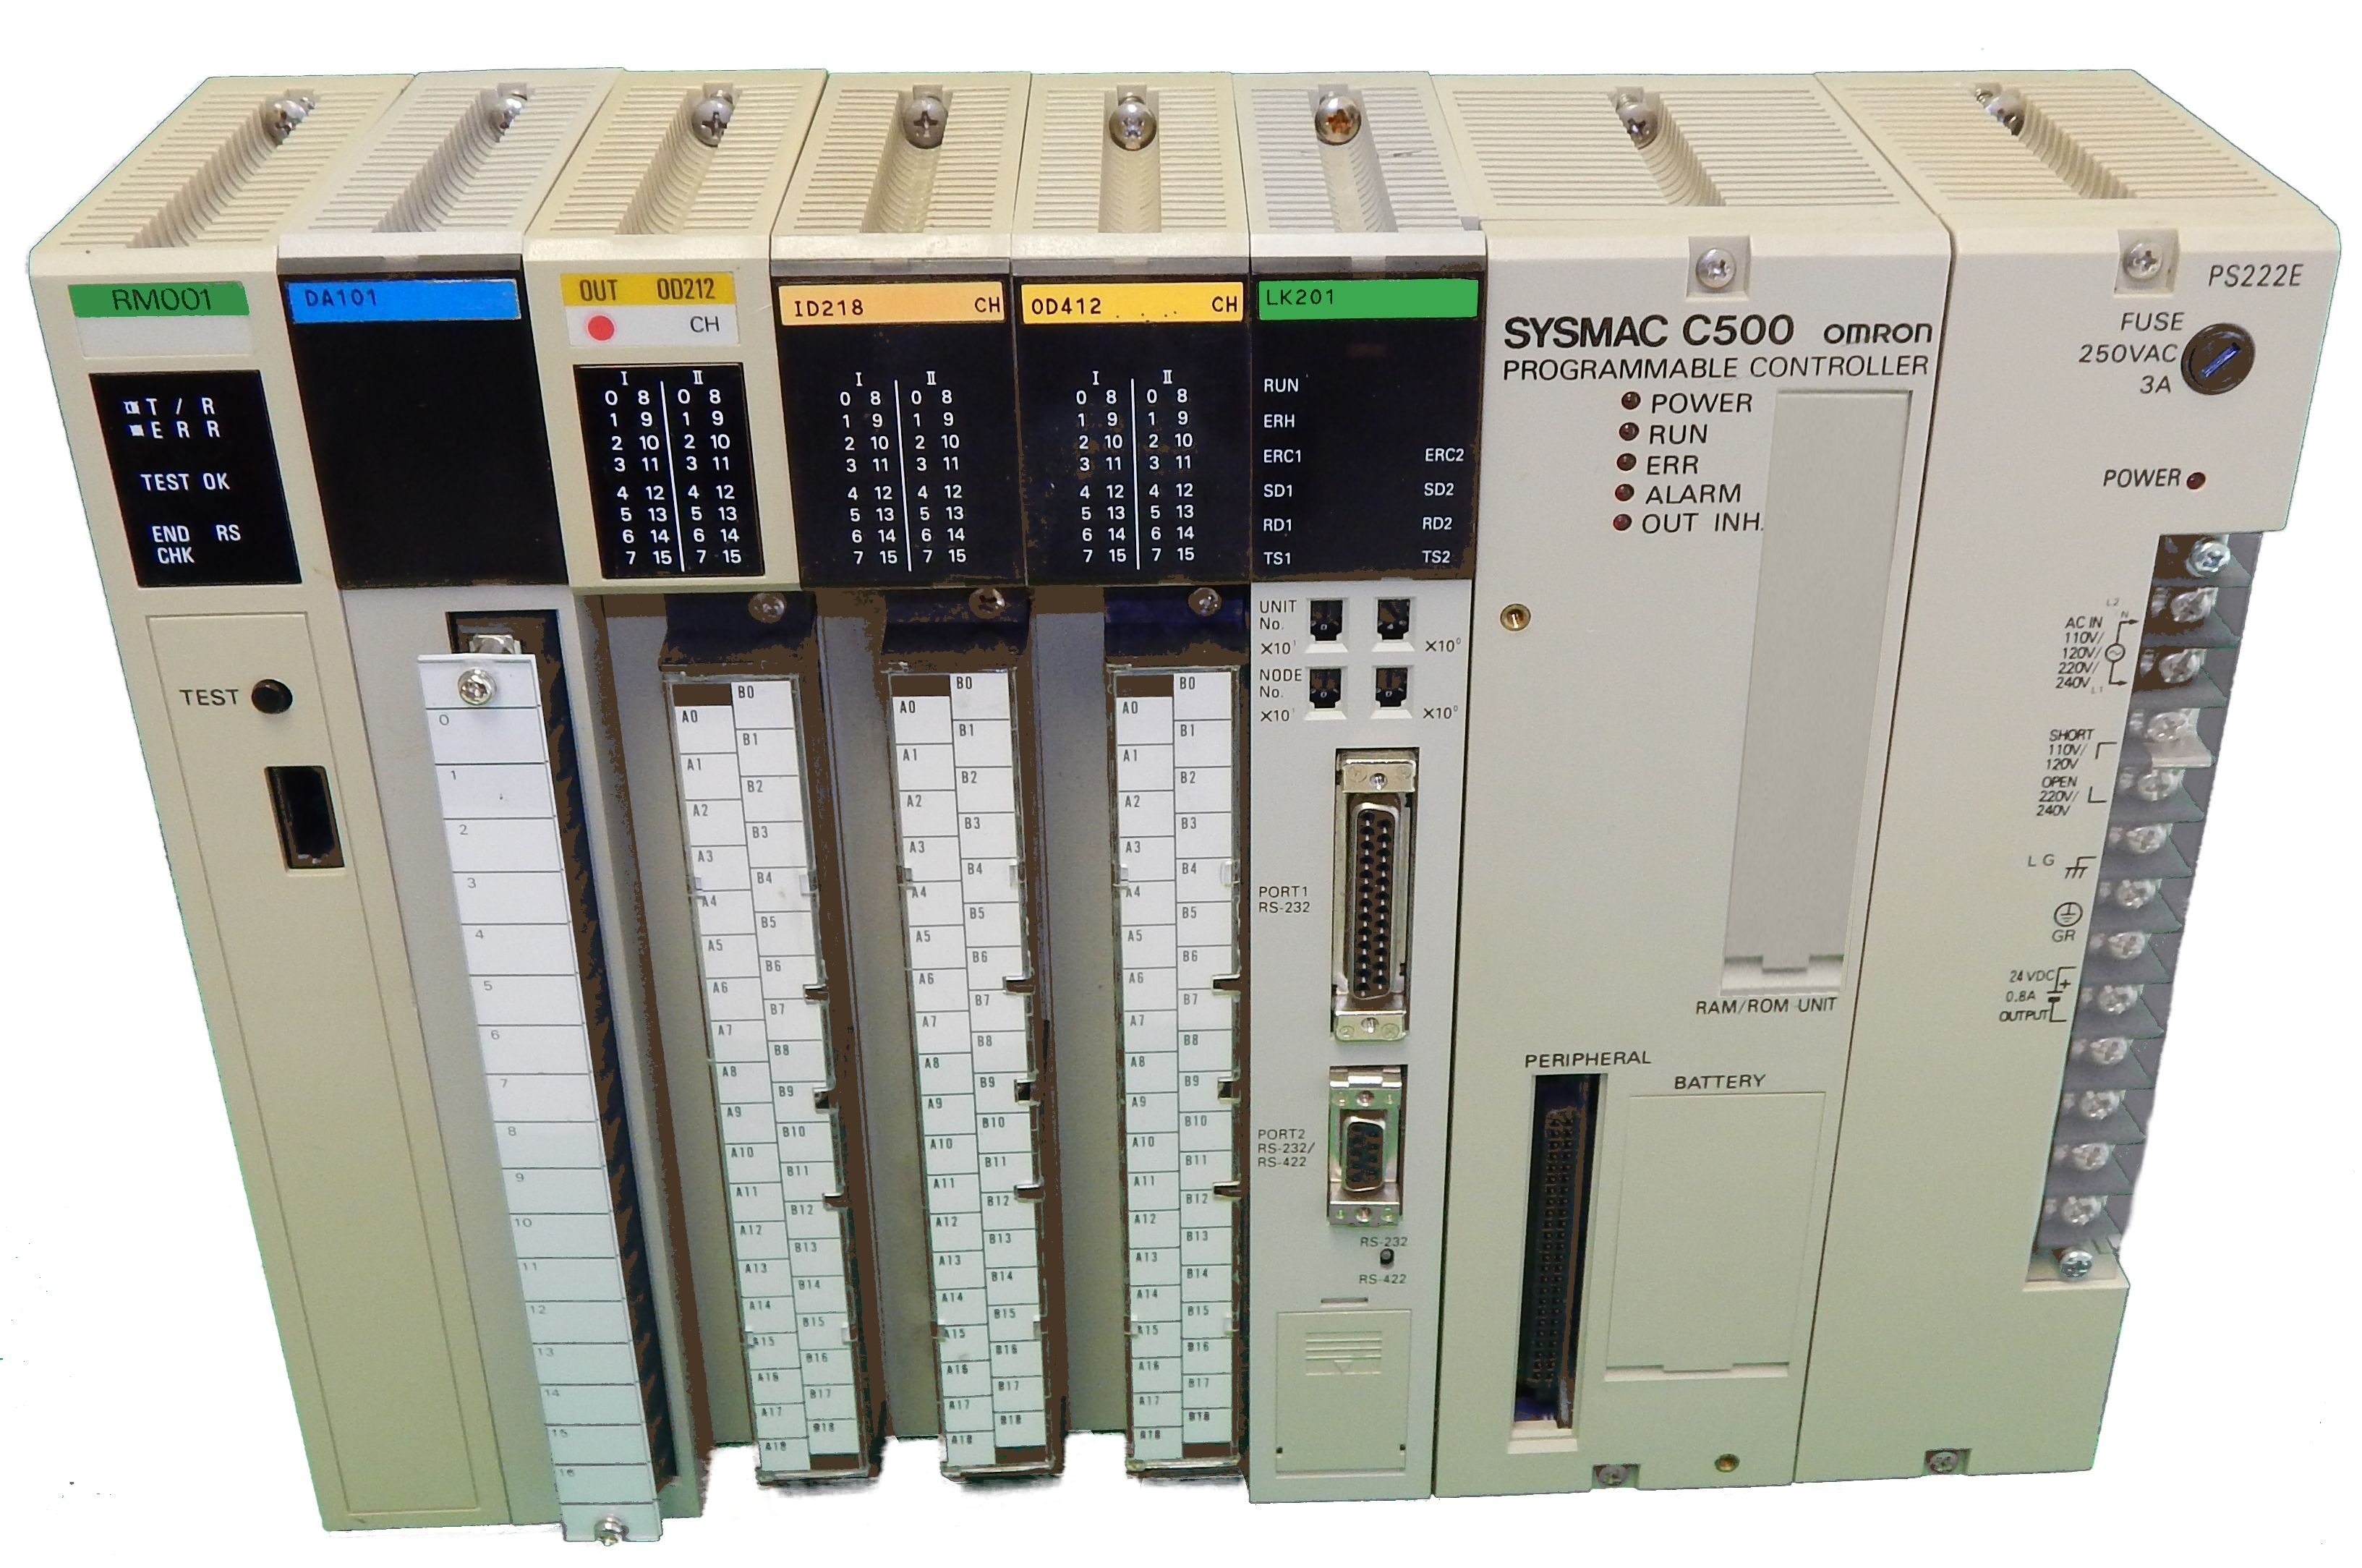 3G2A5-ID215